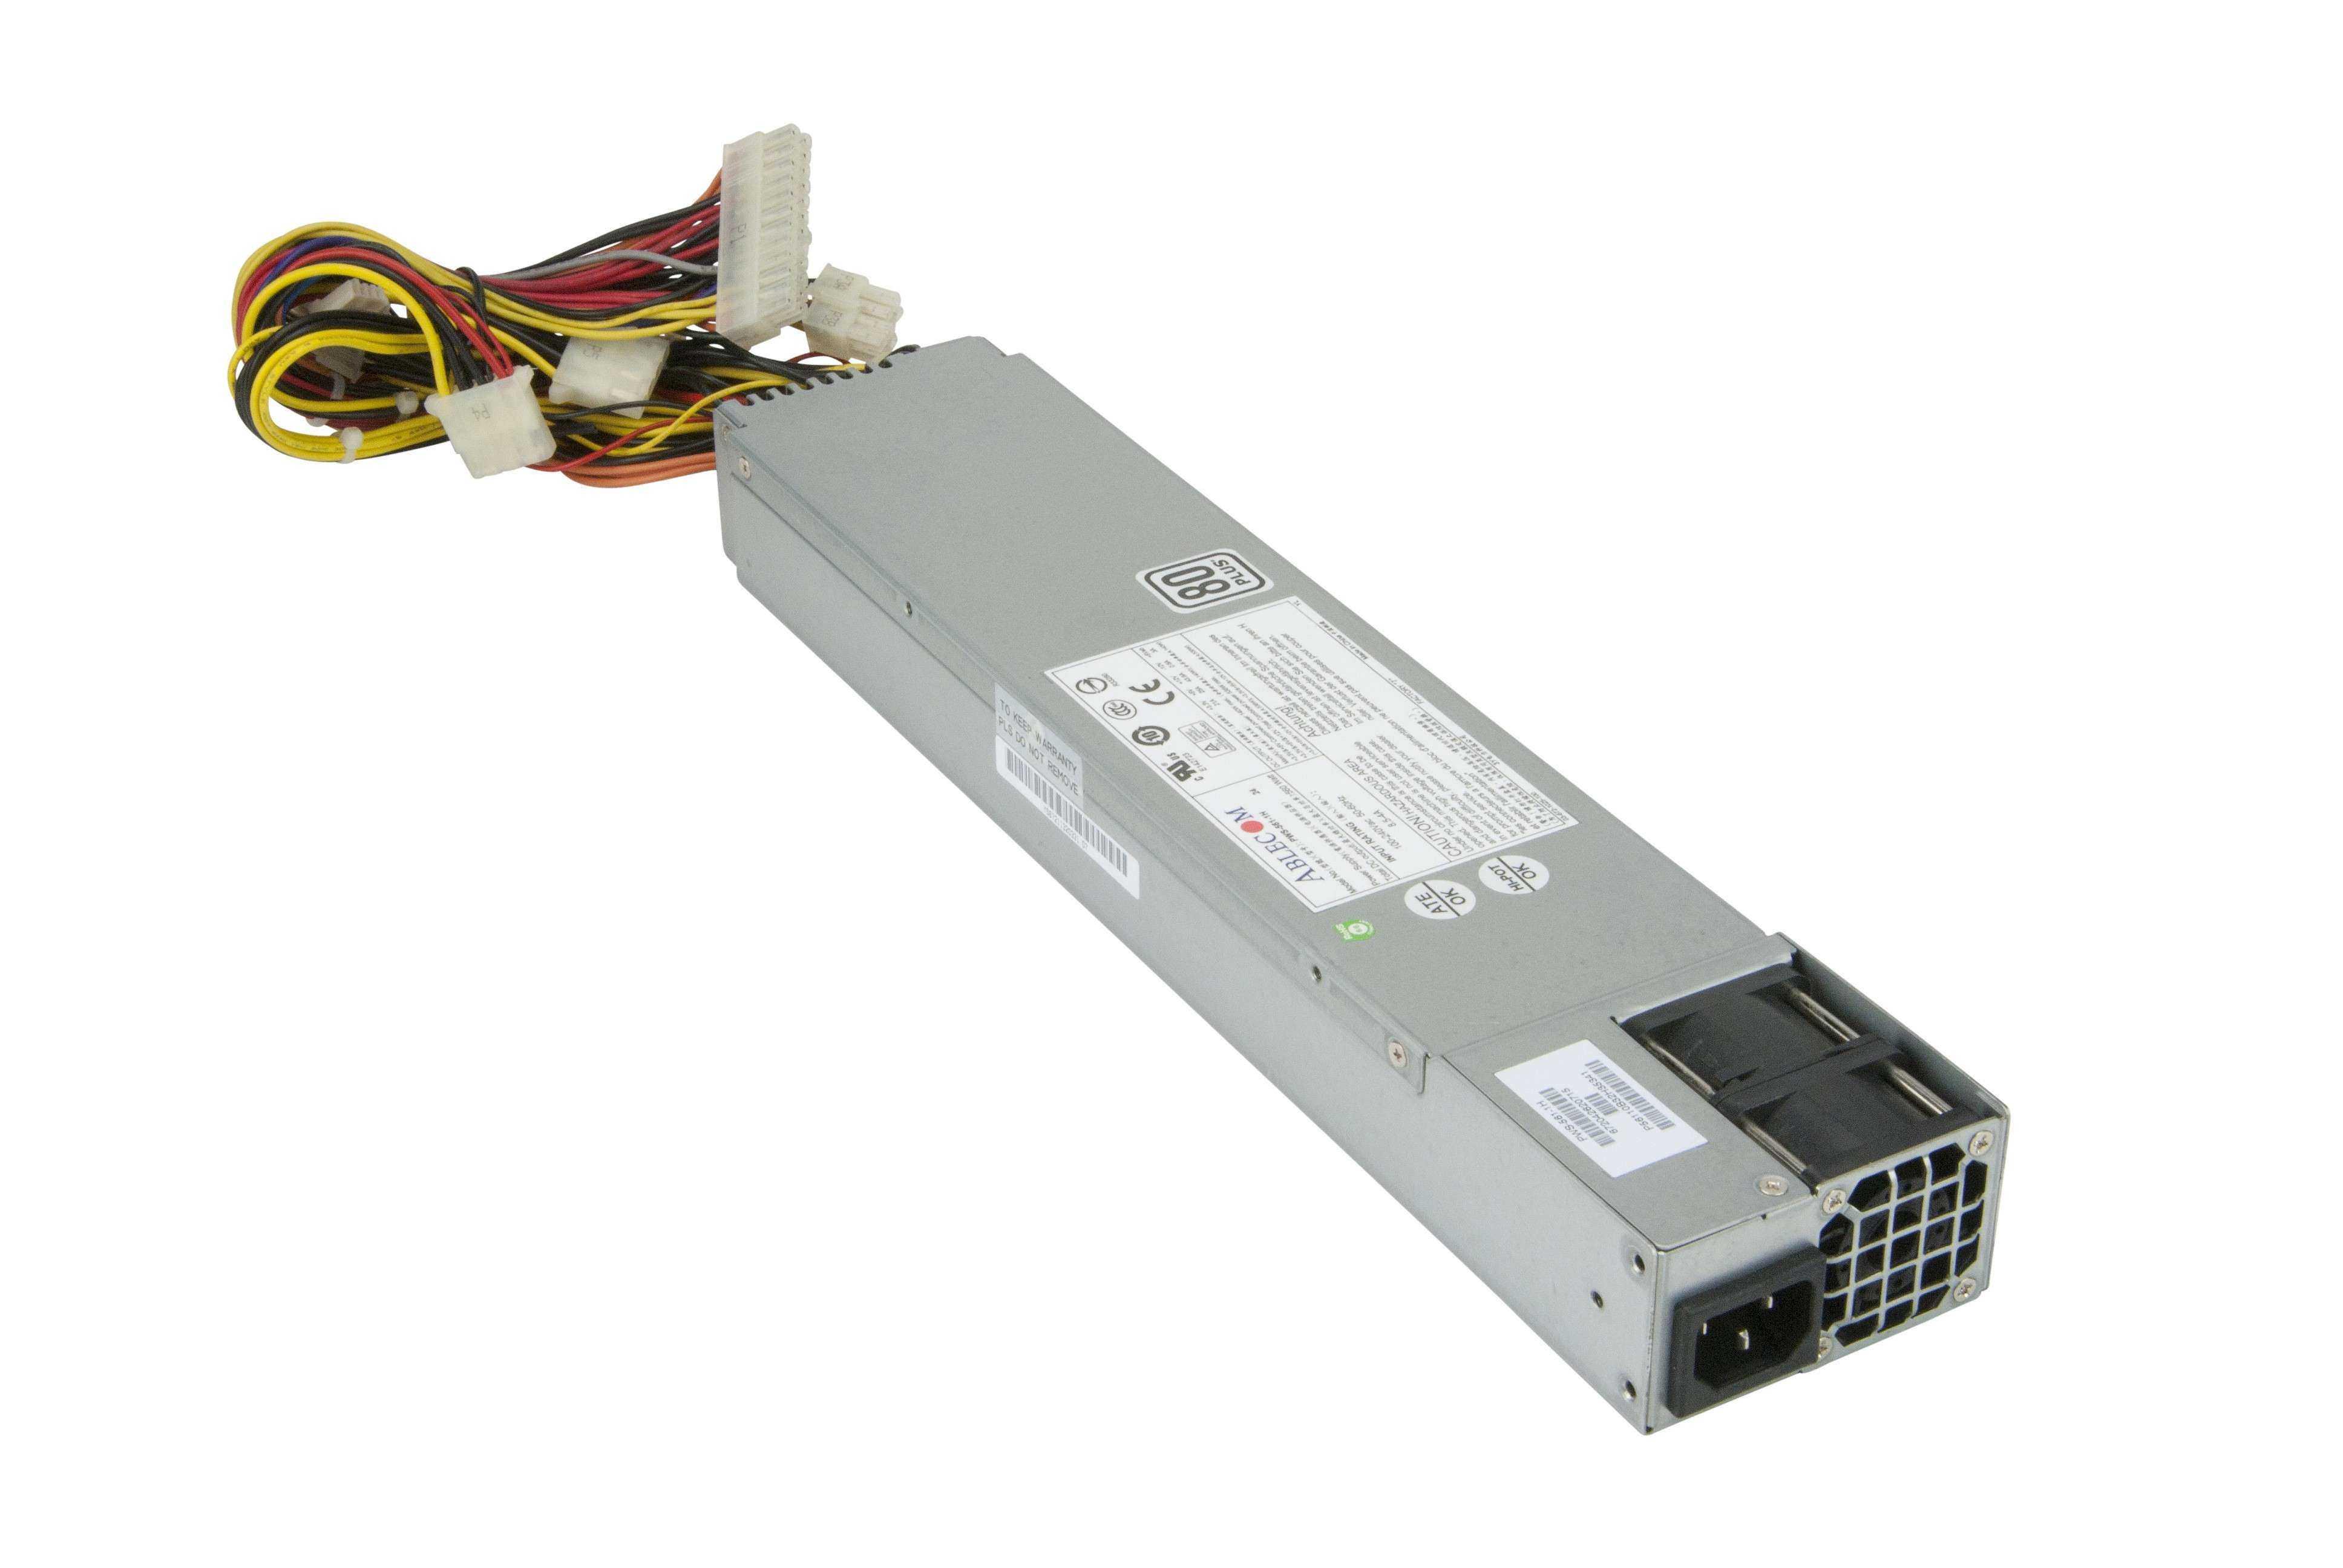 Supermicro 560W 1U Multi-Output Power Supply (PWS-561-1H)